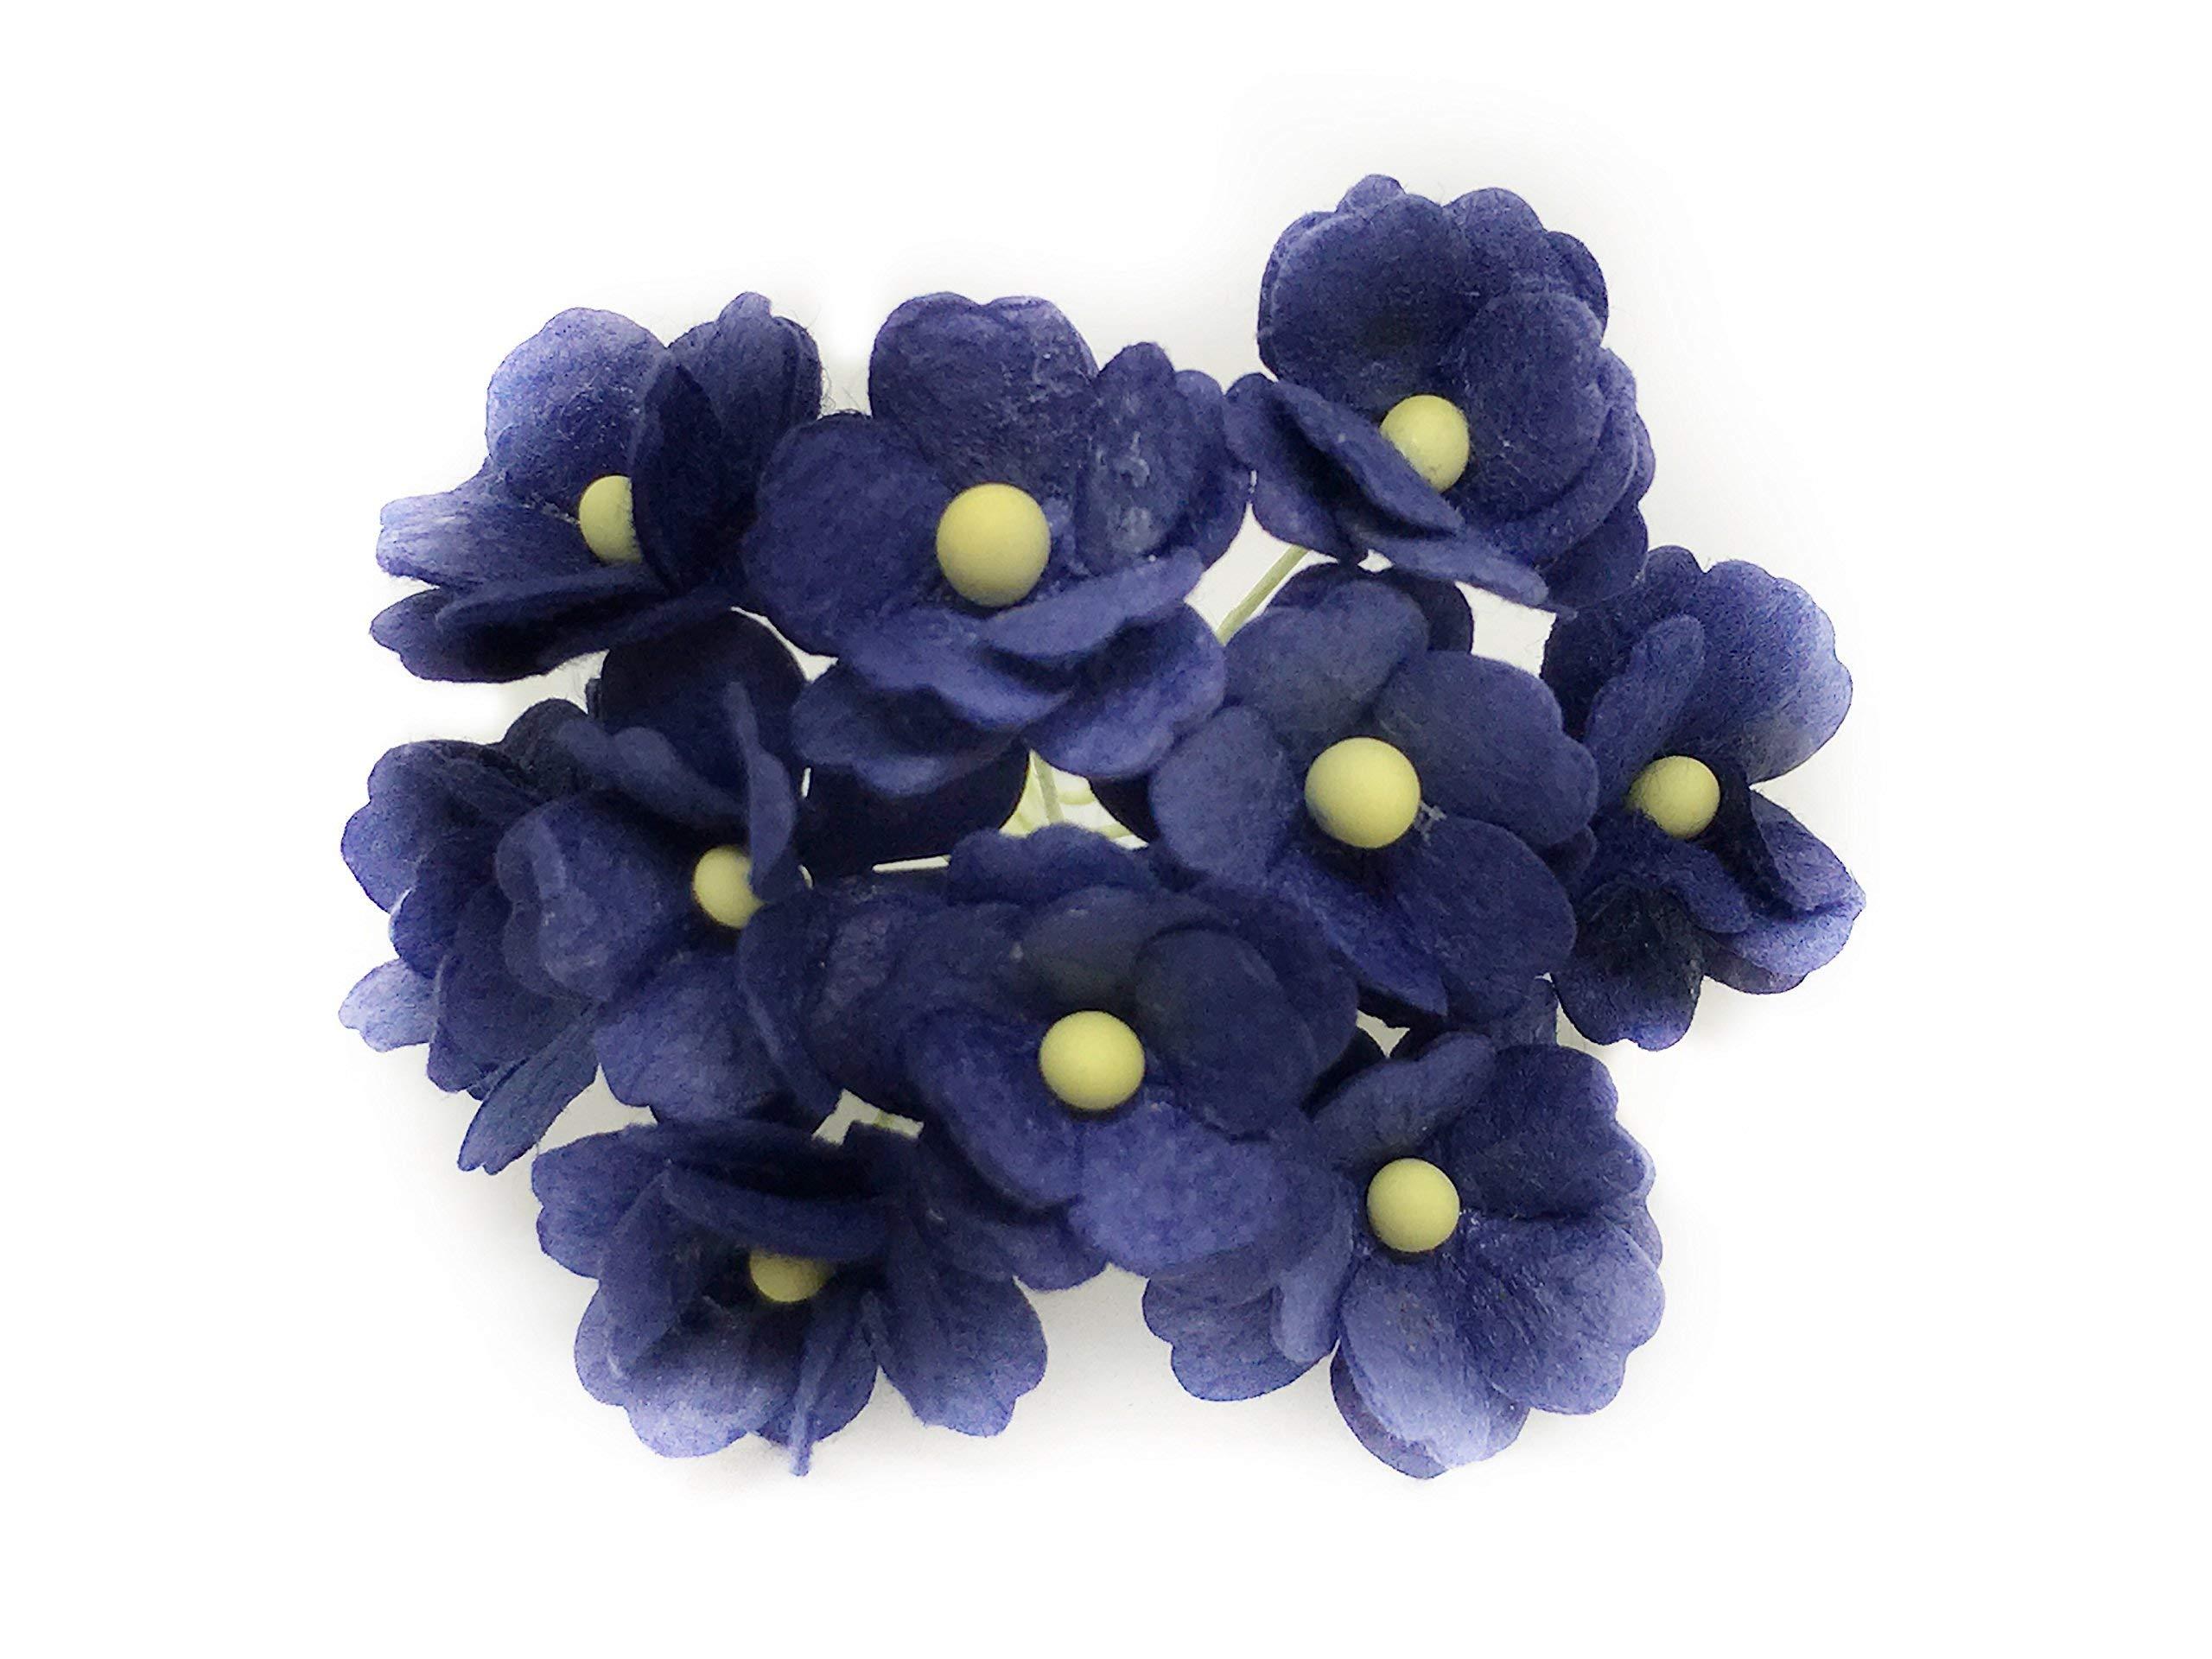 15cm-Navy-Blue-Mulberry-Paper-Flowers-Navy-Paper-Hydrangea-Wedding-Flowers-Wedding-Decor-Wedding-Table-Flowers-Navy-Blue-Wedding-Artificial-Flowers-50-Pieces